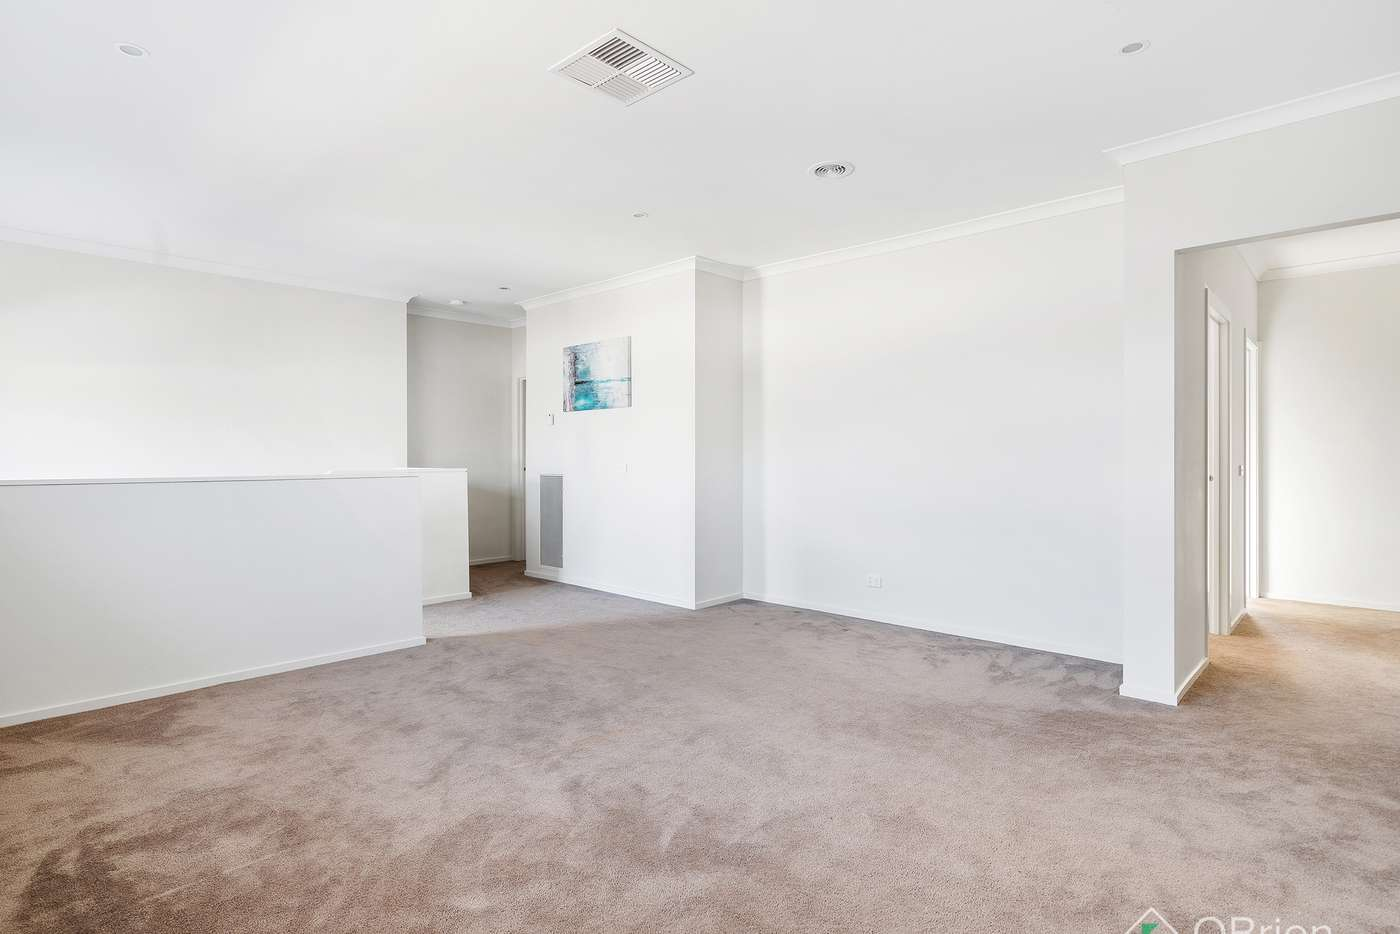 Seventh view of Homely house listing, 20 Glenfern Street, Keysborough VIC 3173